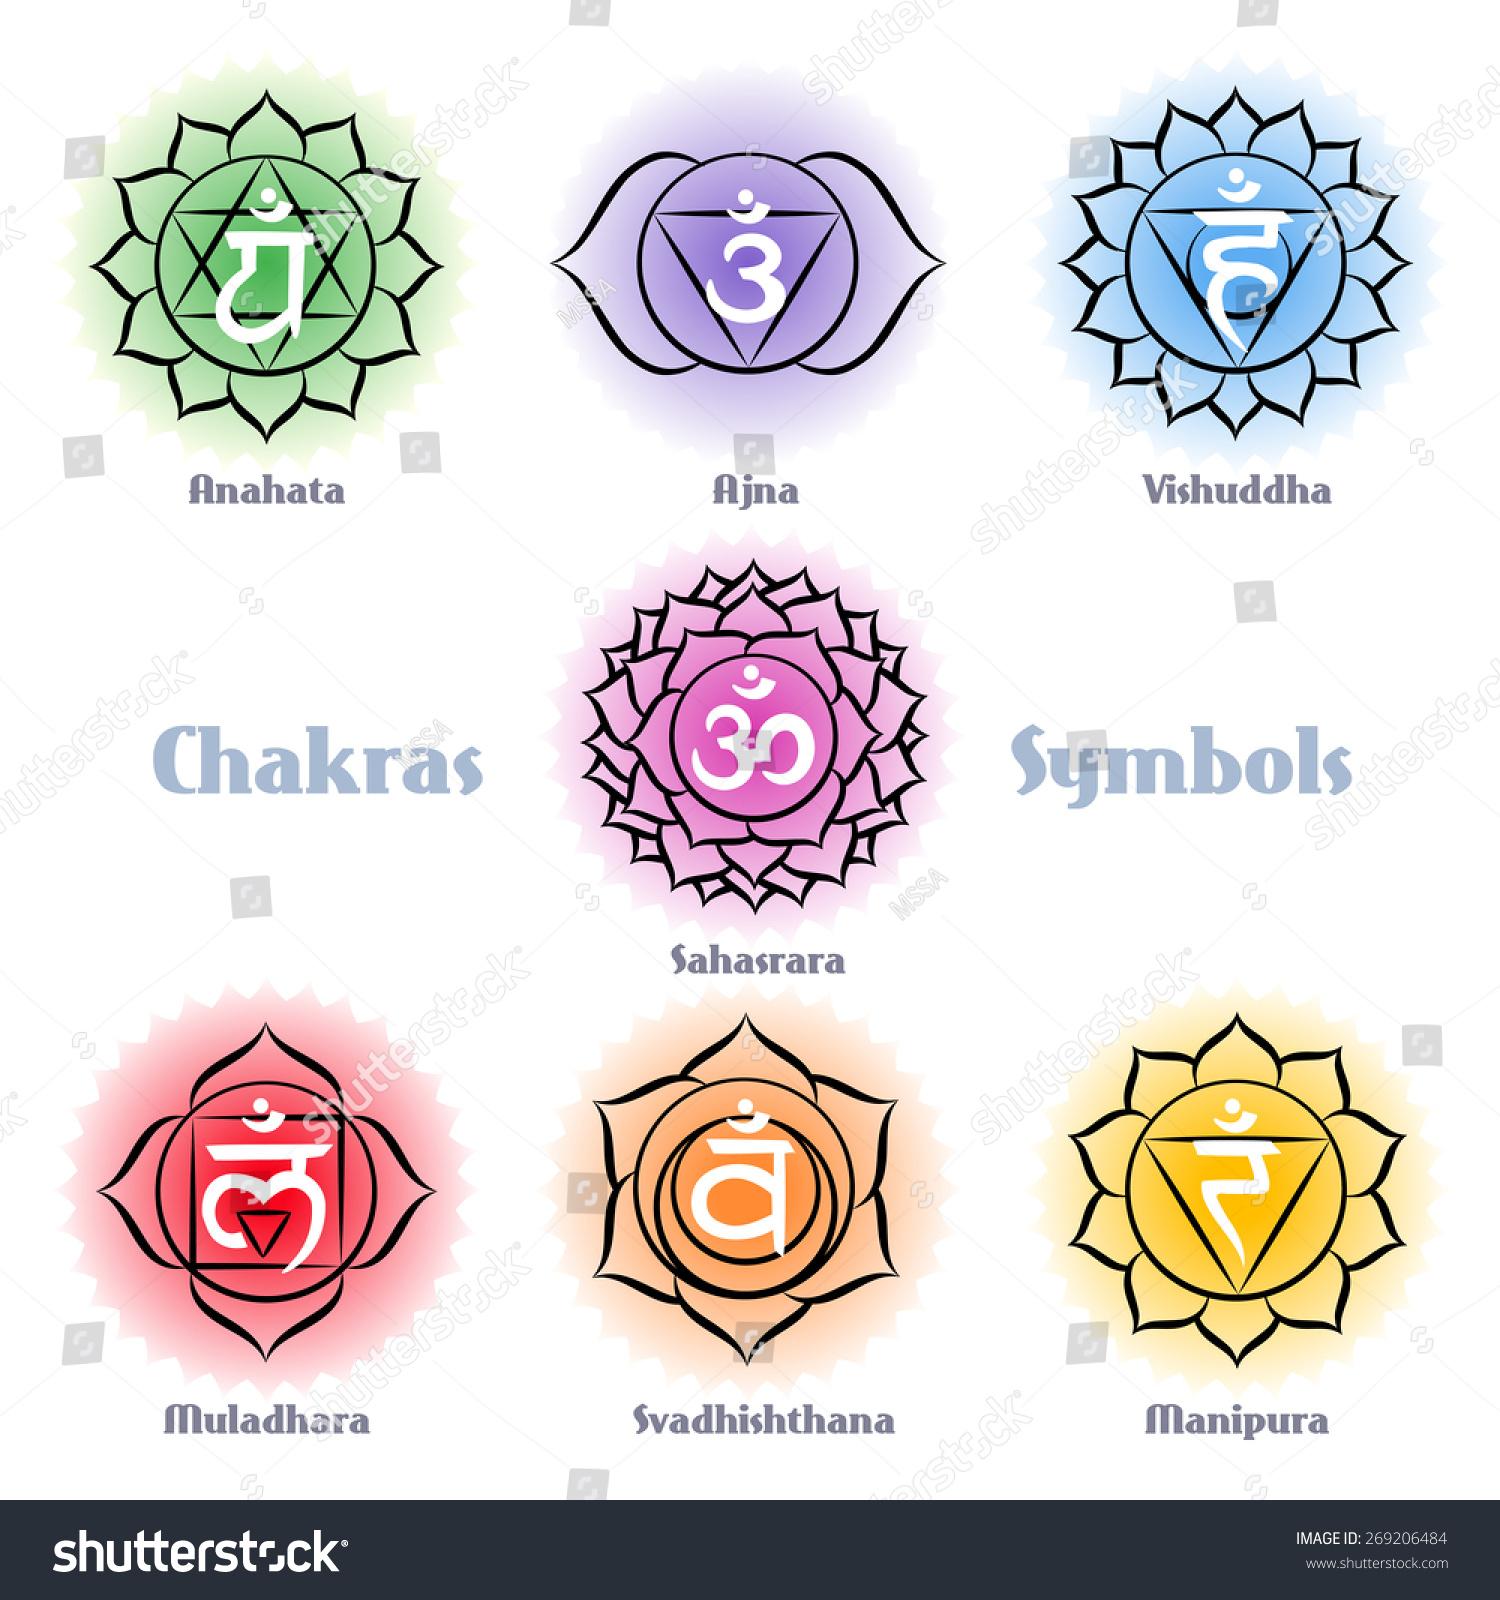 Pin Vector Chakra Series Swadhisthana Or Sacral Symbol on ...